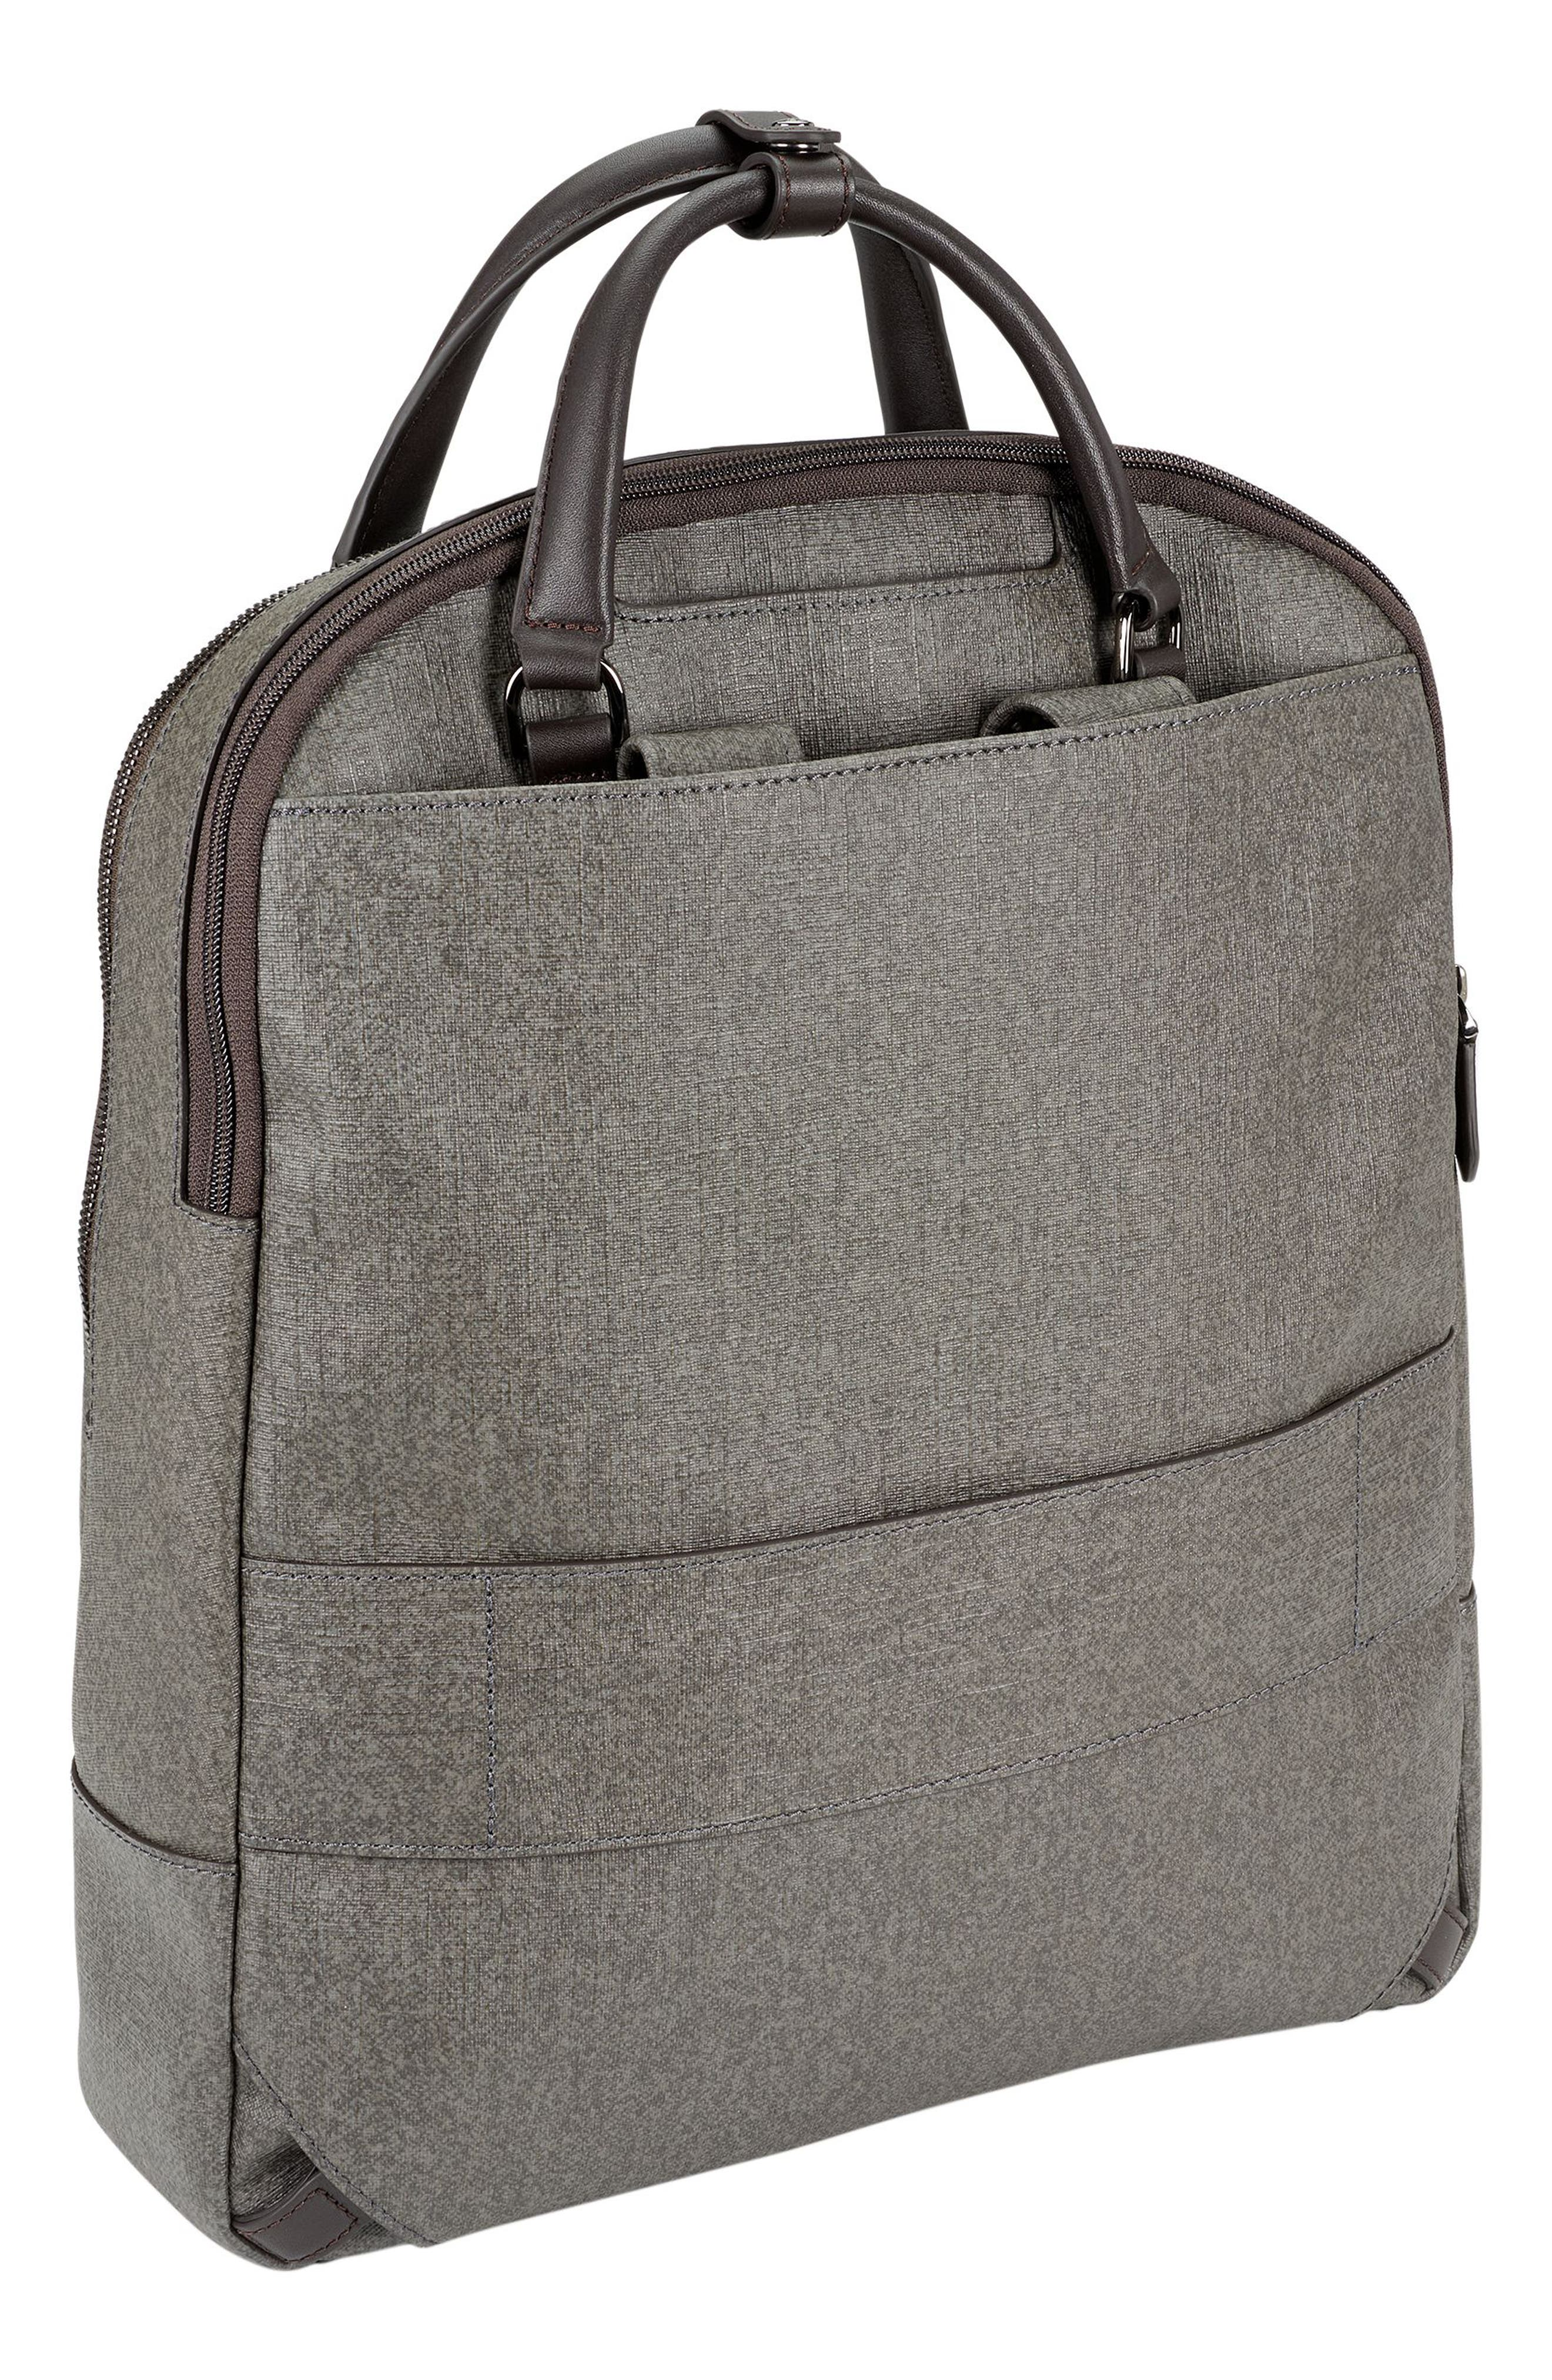 Odel Convertible Backpack,                             Alternate thumbnail 8, color,